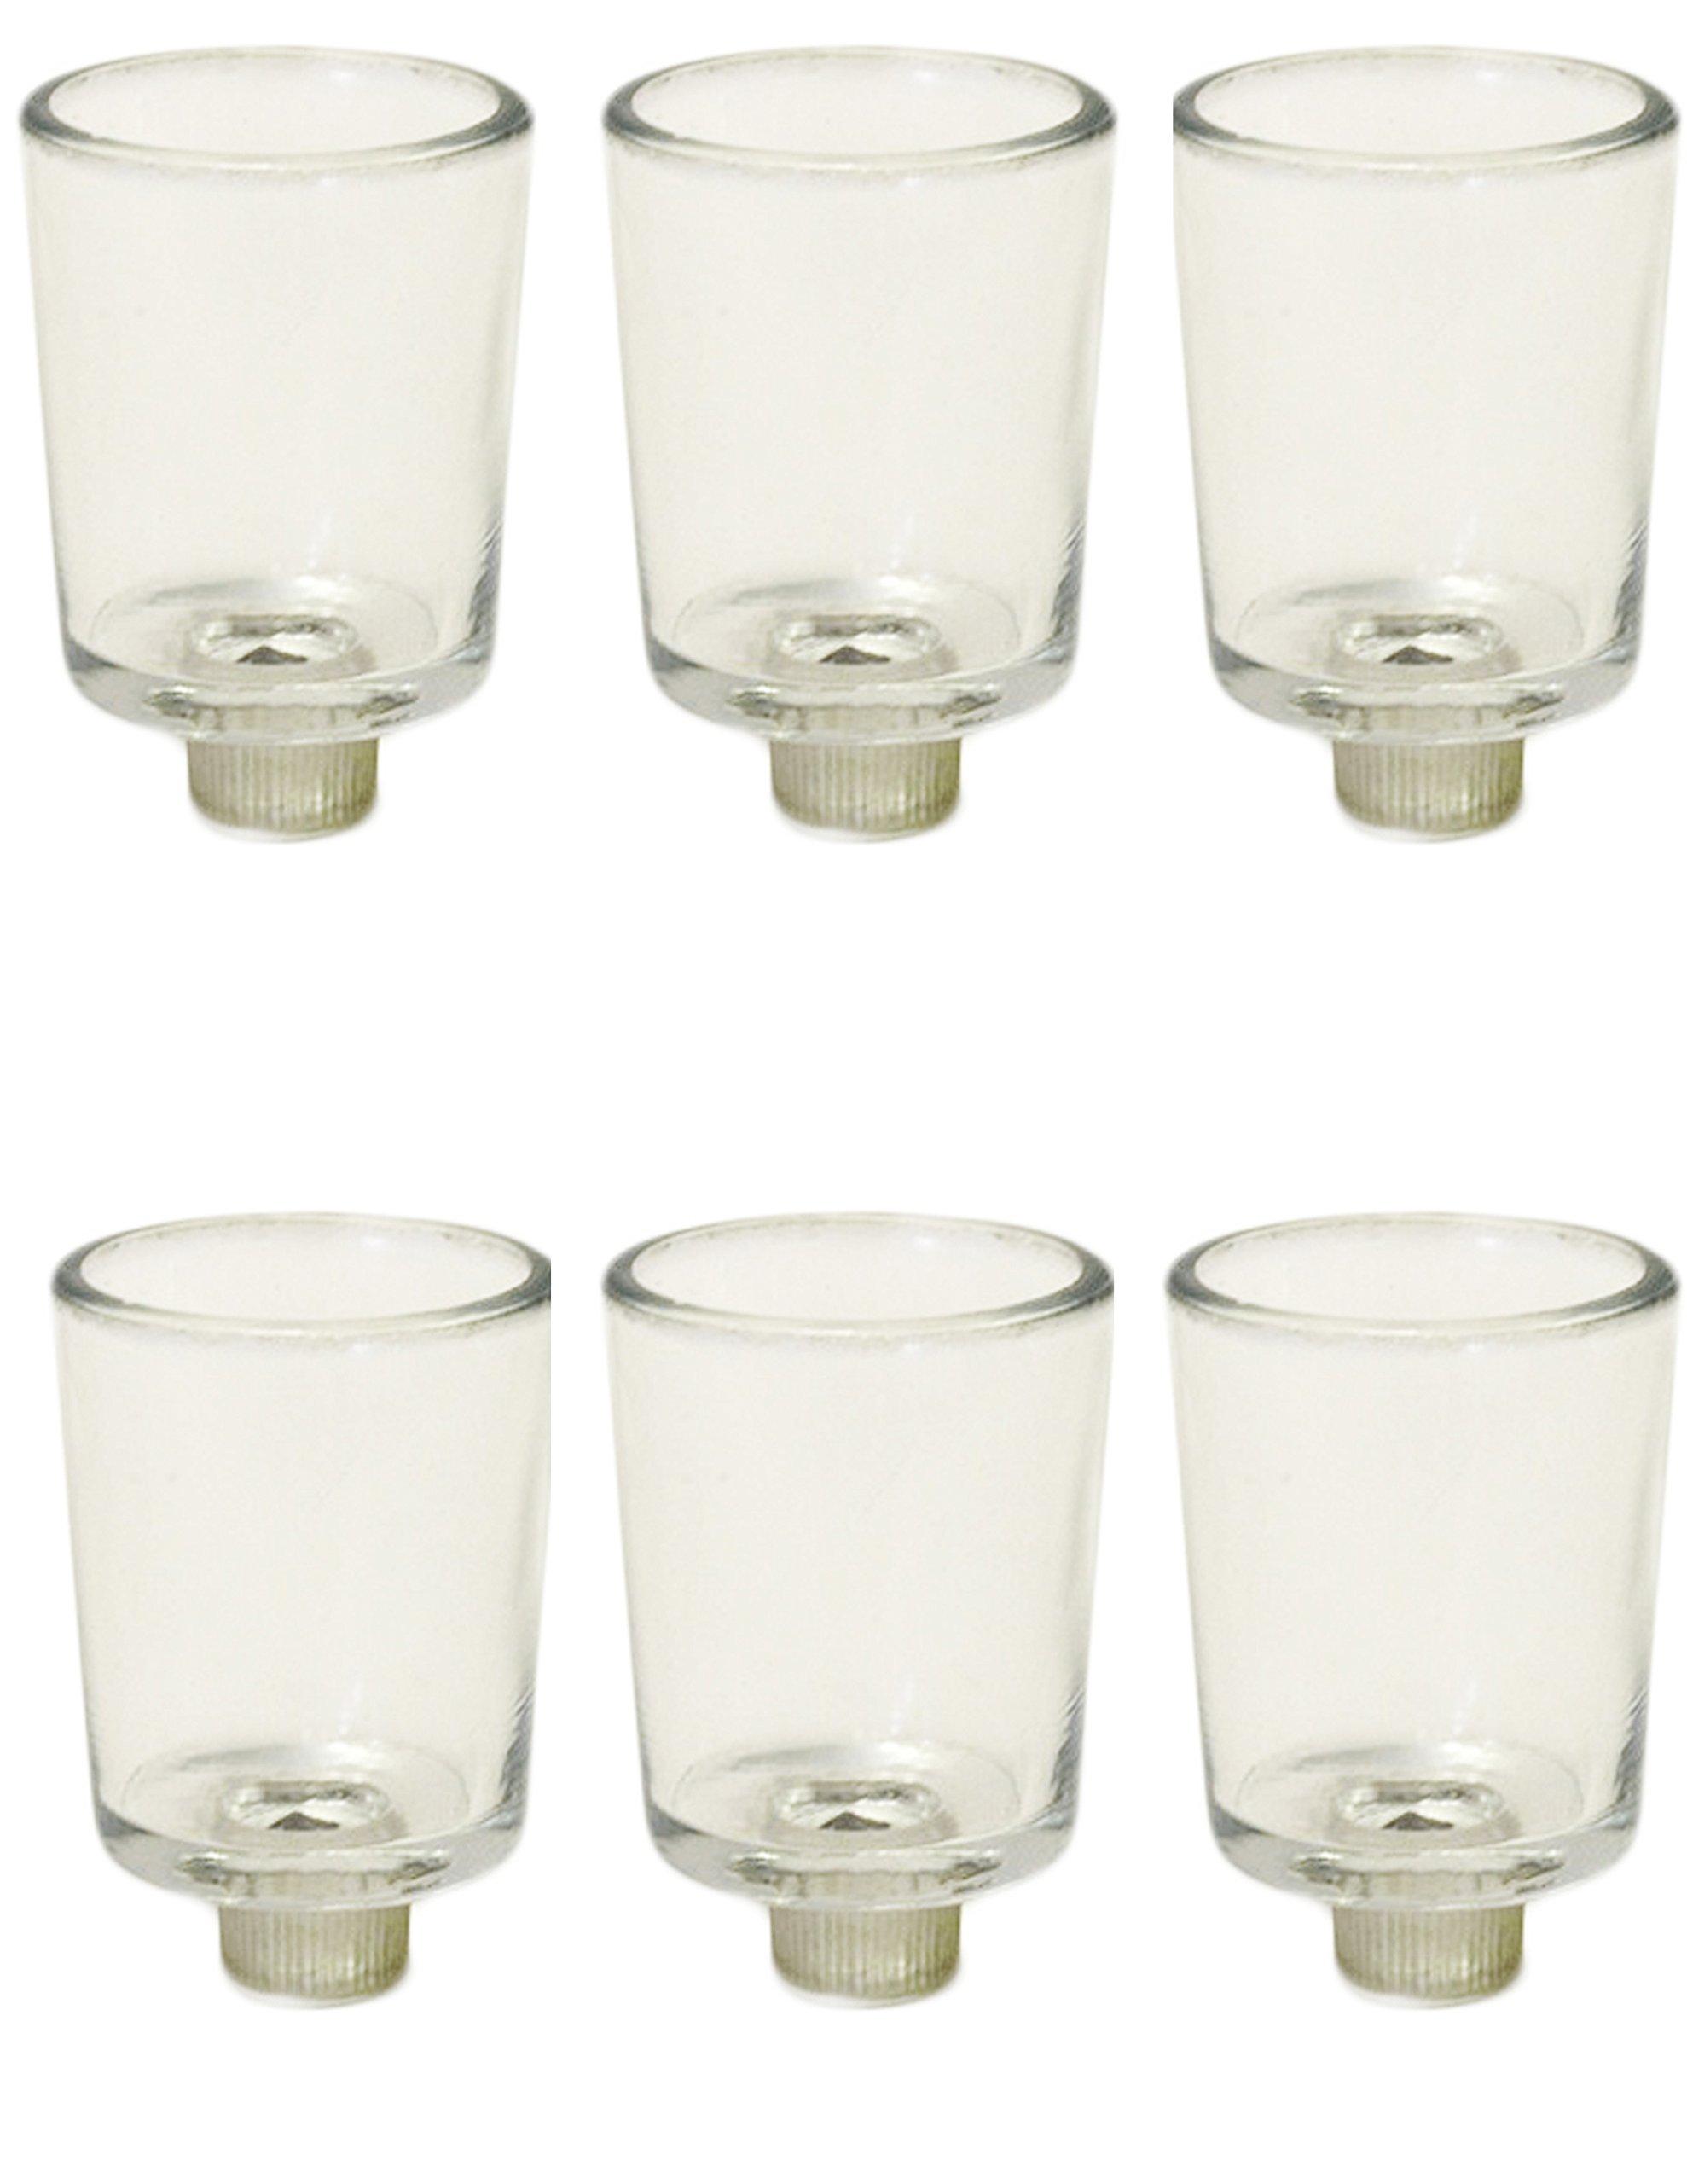 IMA BRASS 12pcs Clear Glass Votive Tea Light Holder with 7/8 in peg. by IMA BRASS